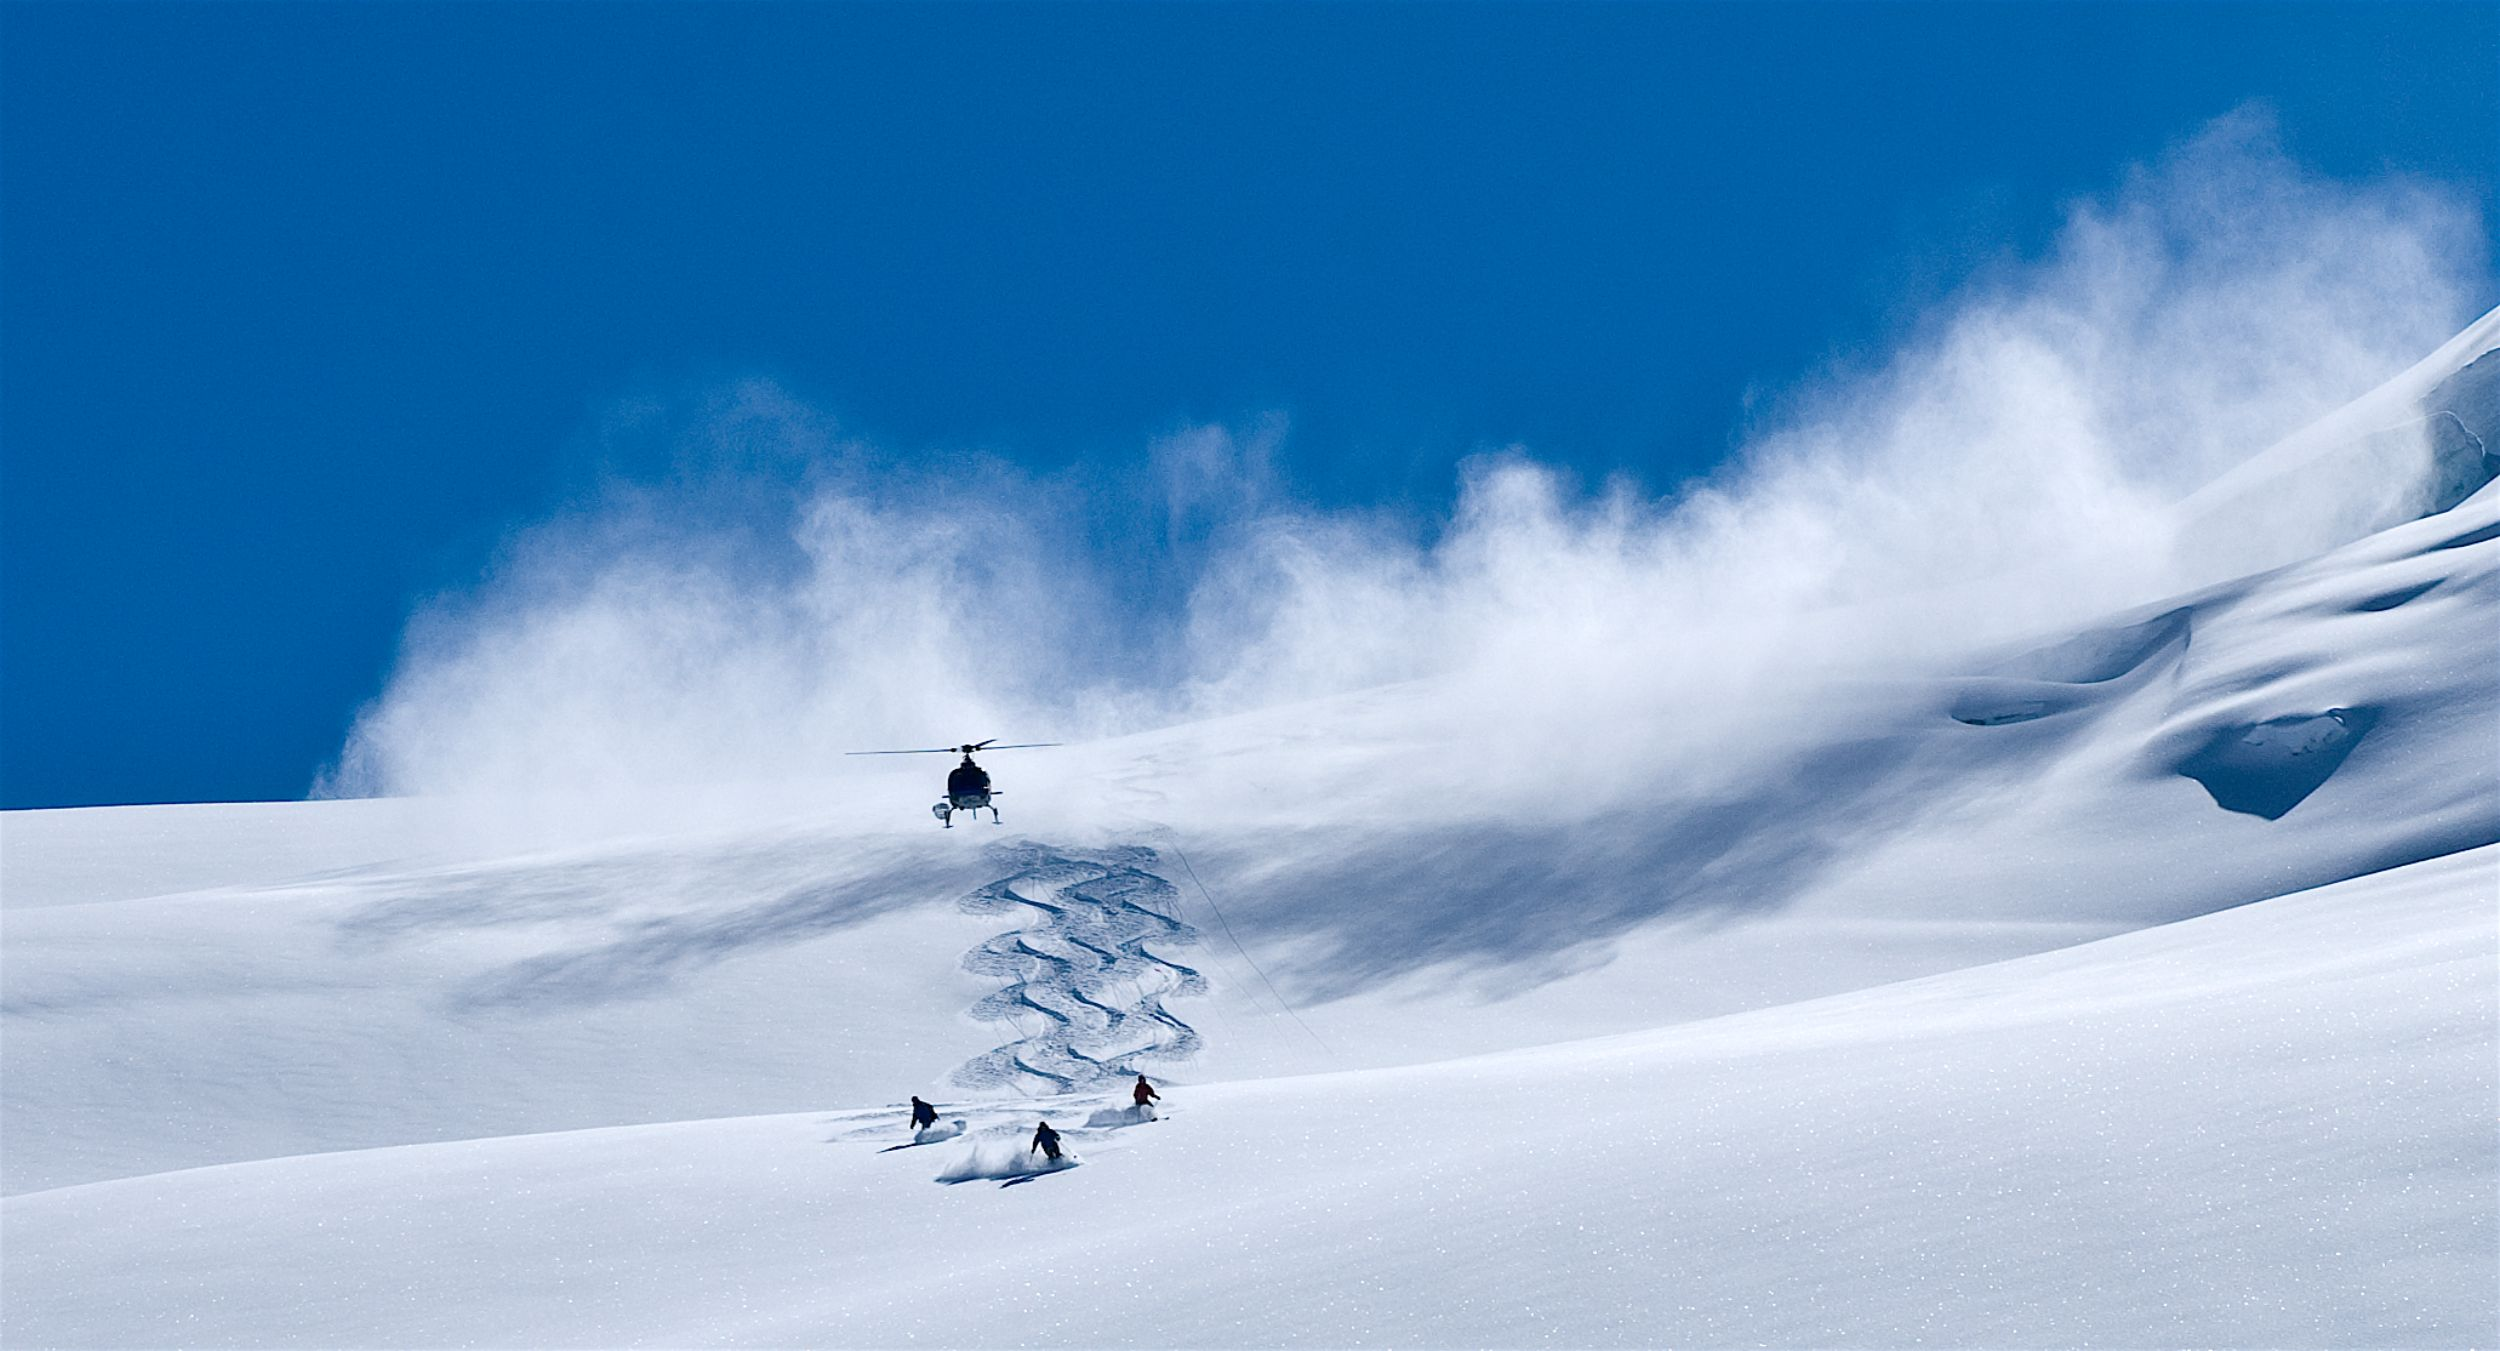 Heli Cloud and Skiers photo Eric Berger and Bella Coola Heli Sports.jpg